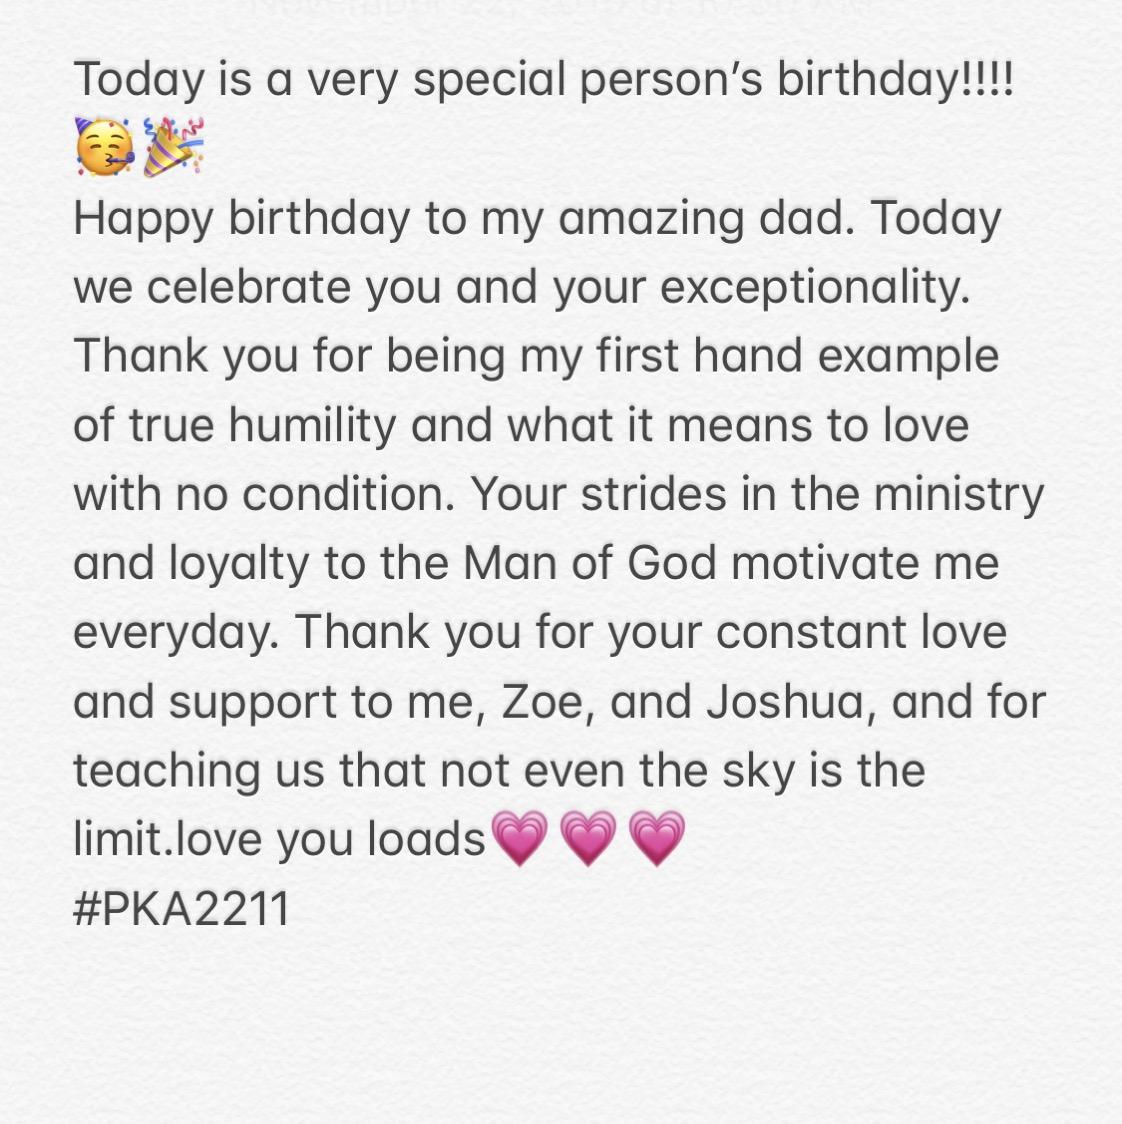 Happy birthday dad!!!🎉🎉🎉❤️ #PKA2211